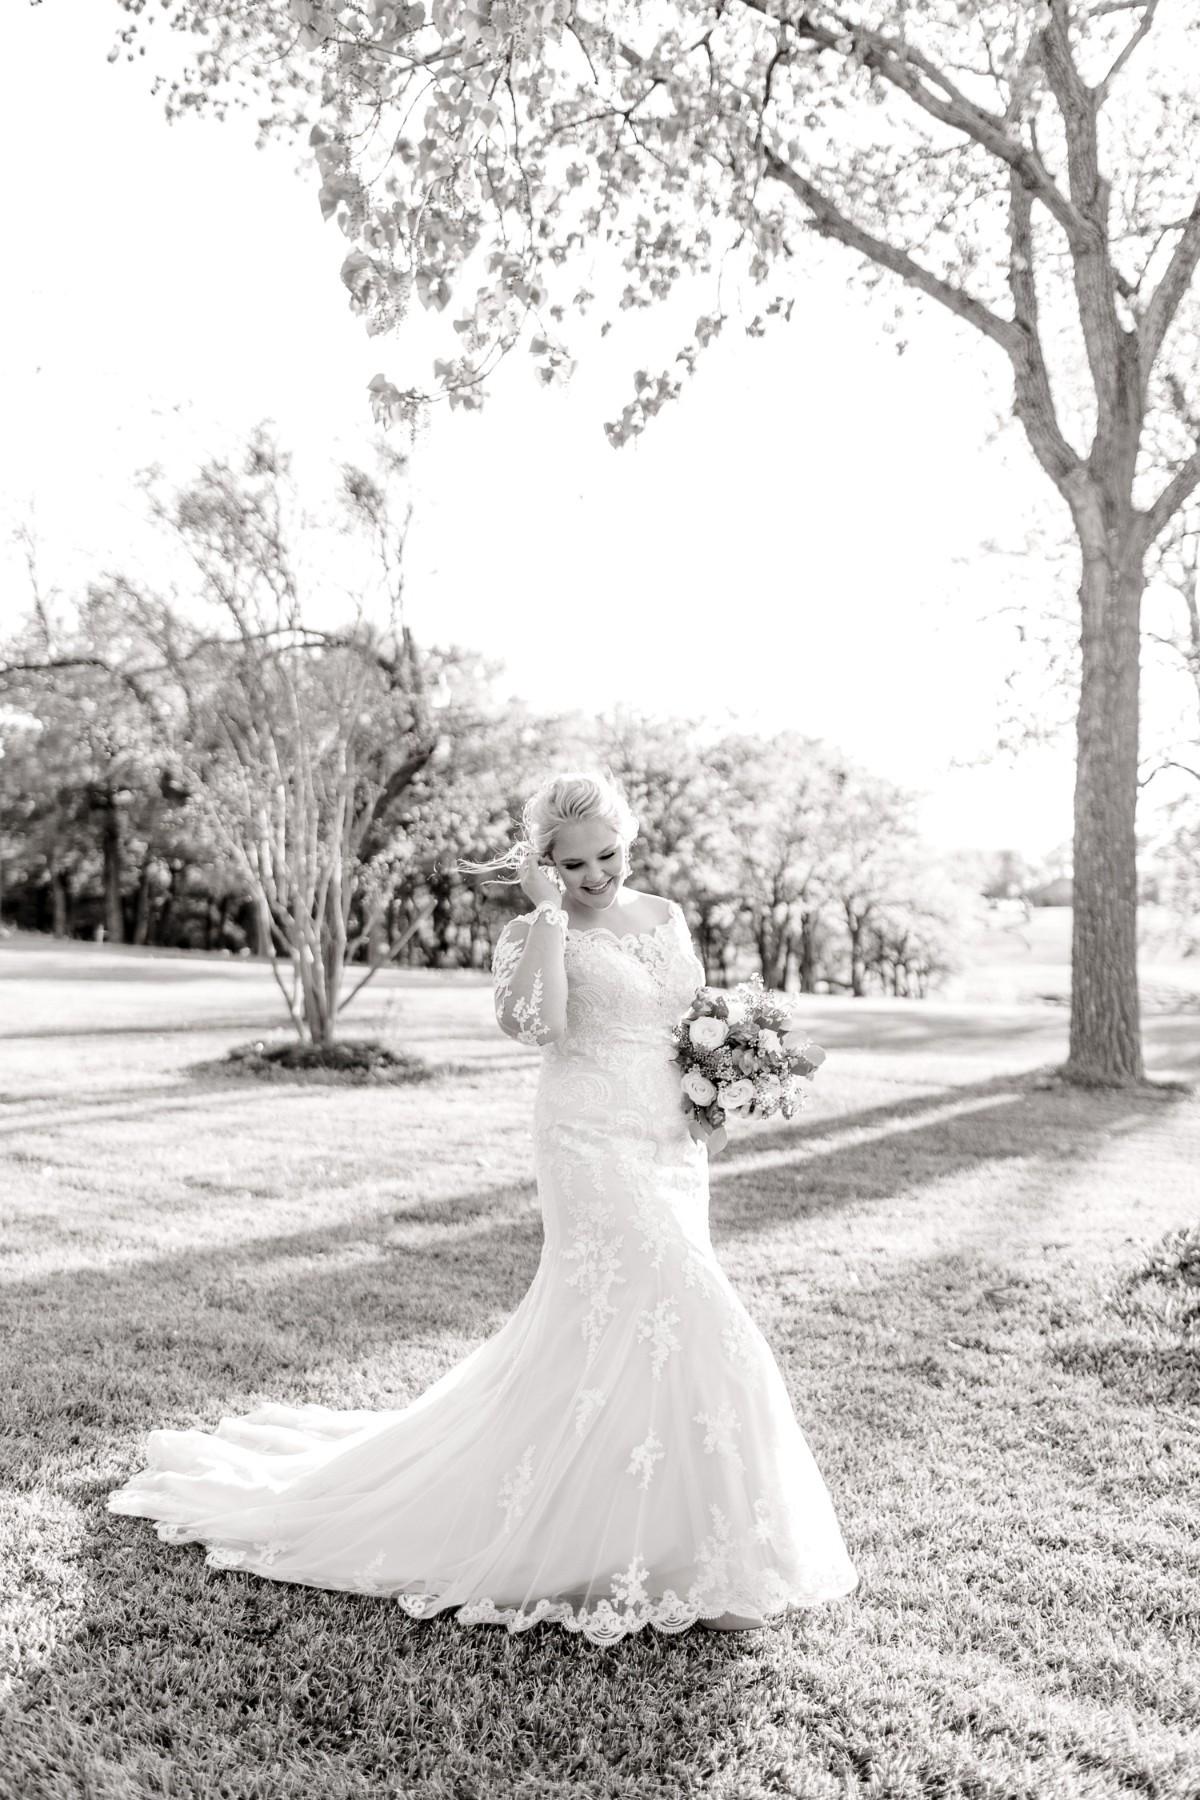 casidy-bridals-tradinghouse-lake-waco-wedding-photographer-kaitlyn-bullard-08.jpg